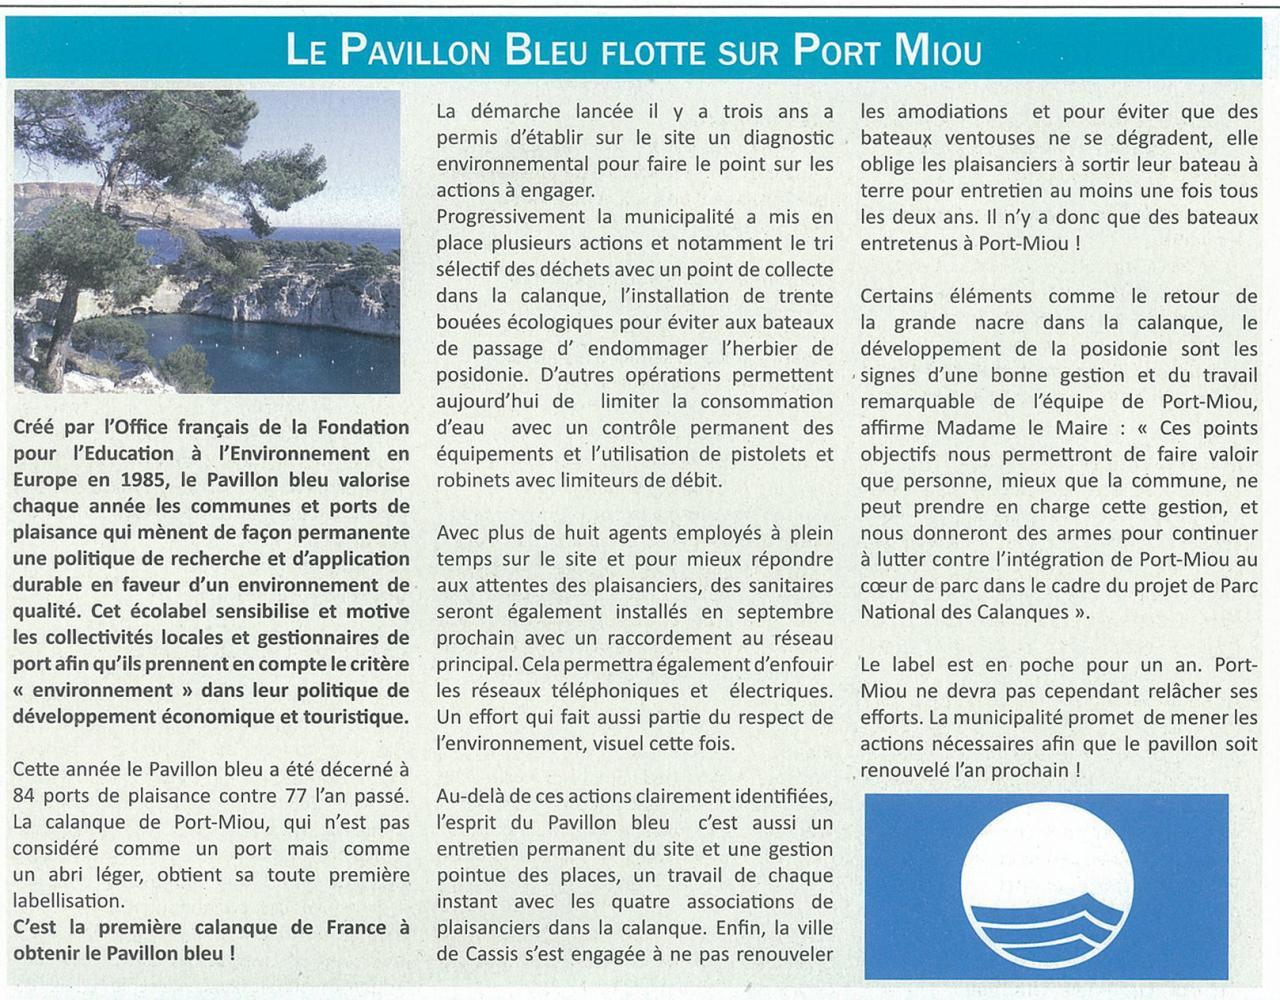 port-miou-pavillon-bleu-4.jpg